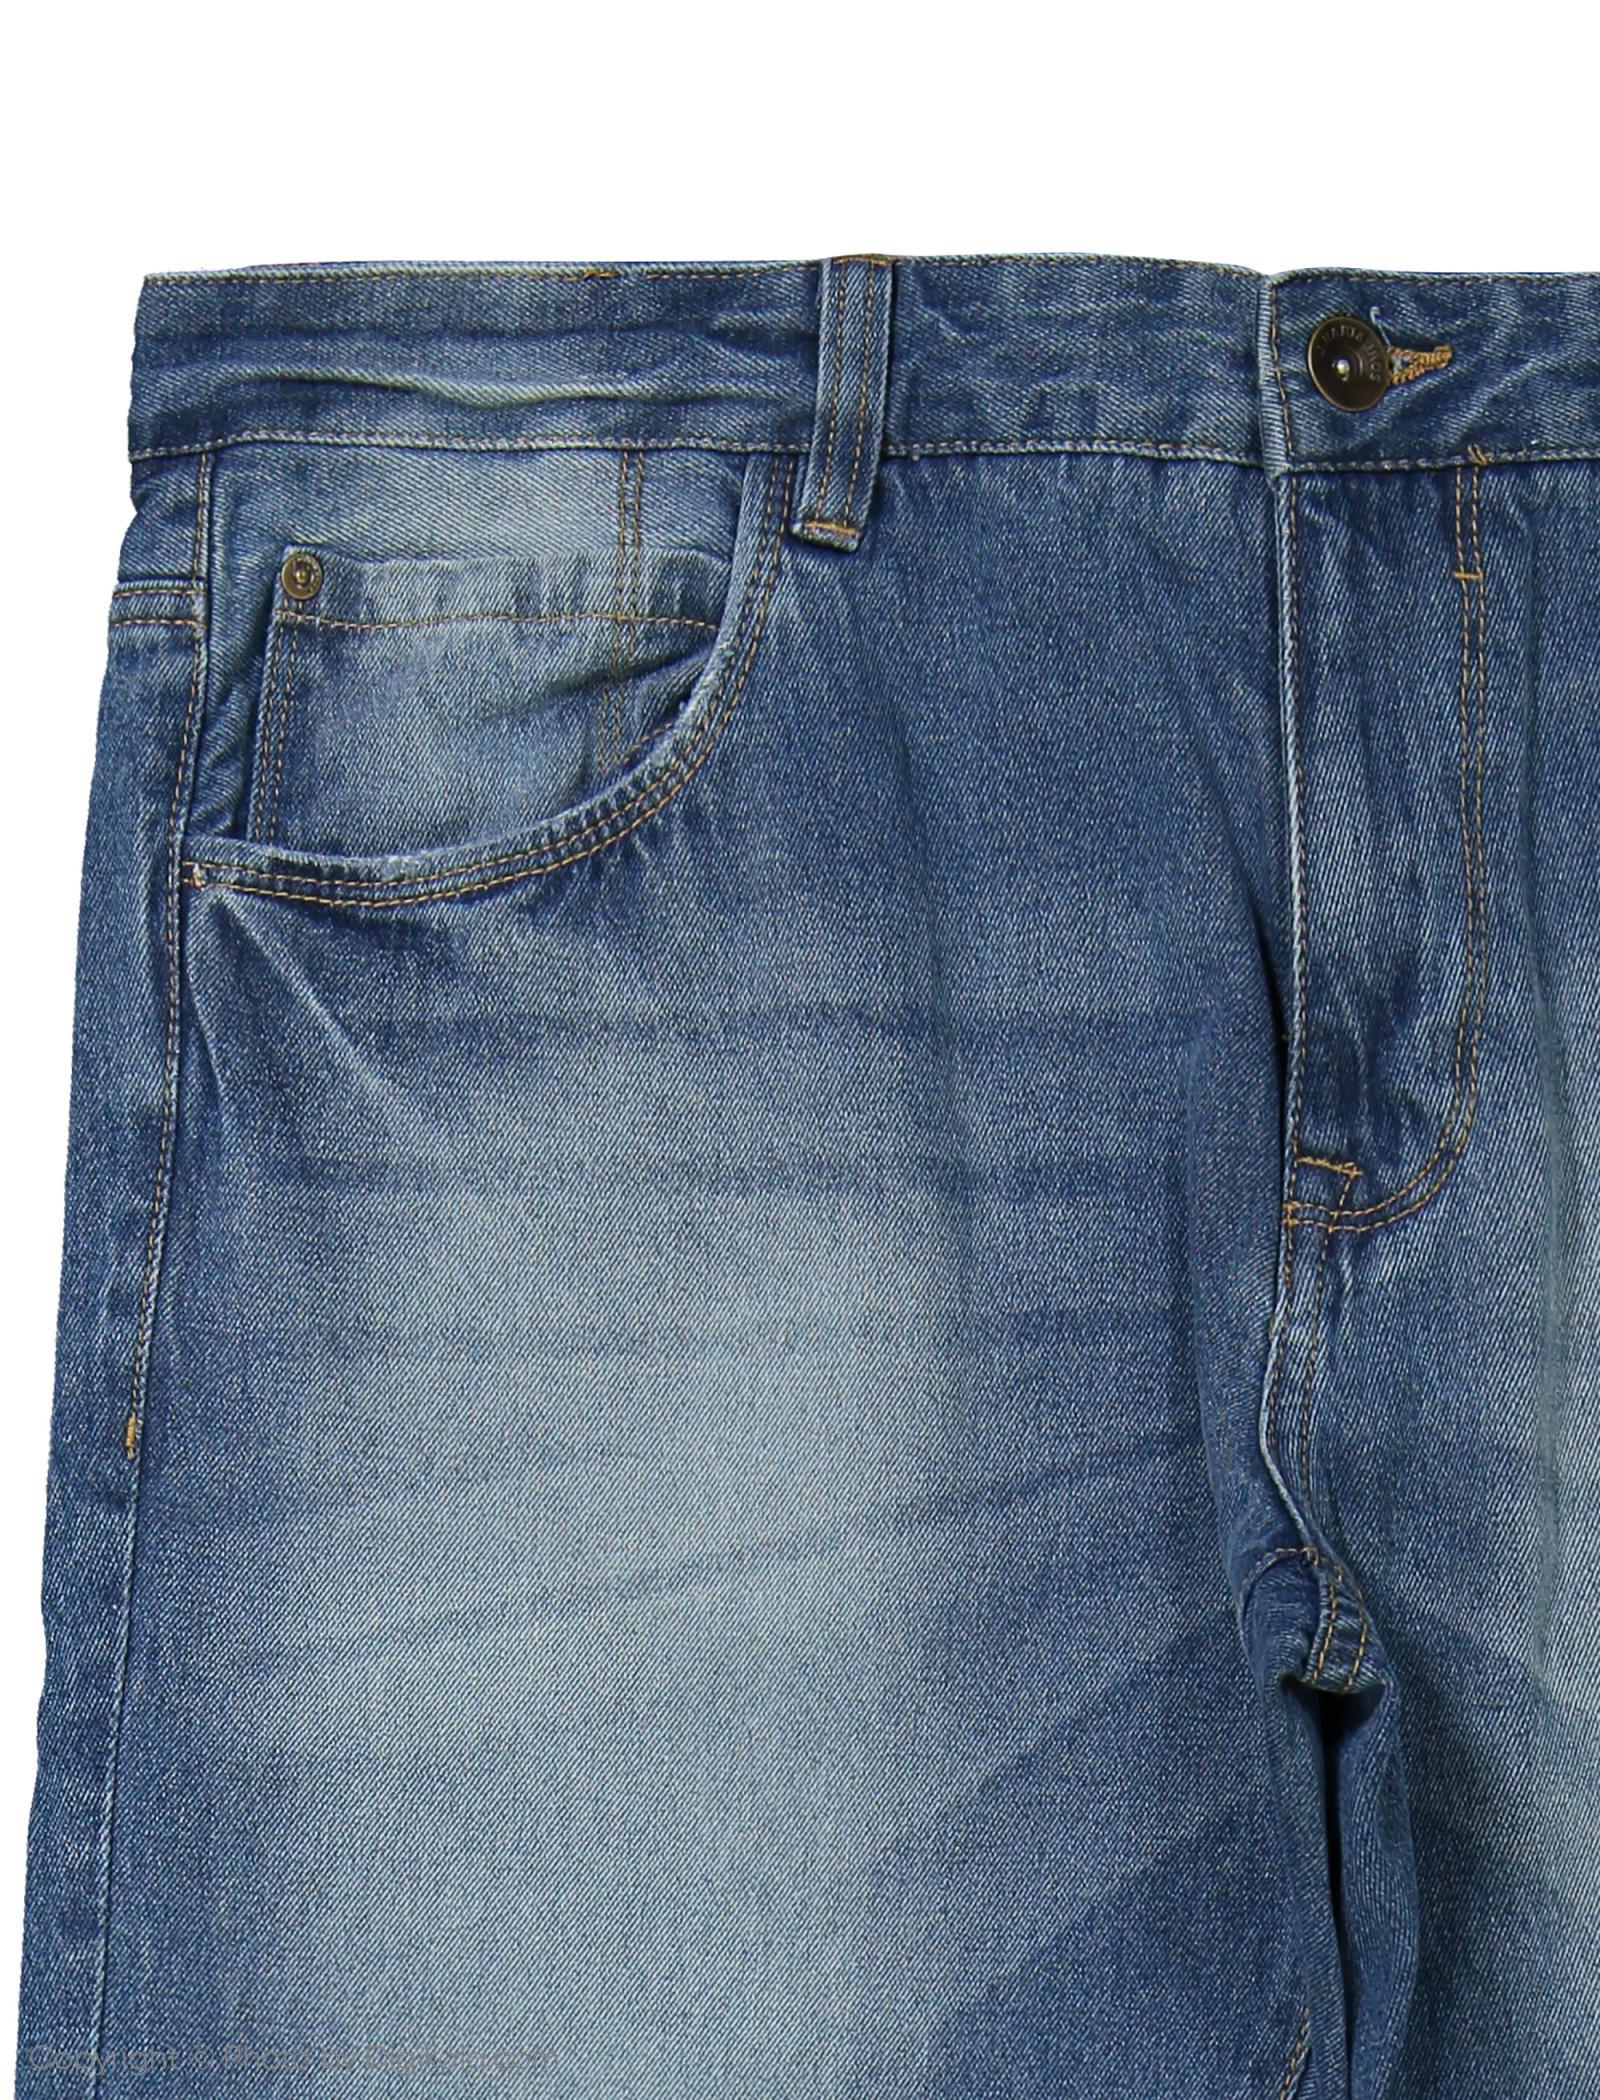 شلوار جین مردانه مردانه مدل 9984240 - یوپیم -  - 3